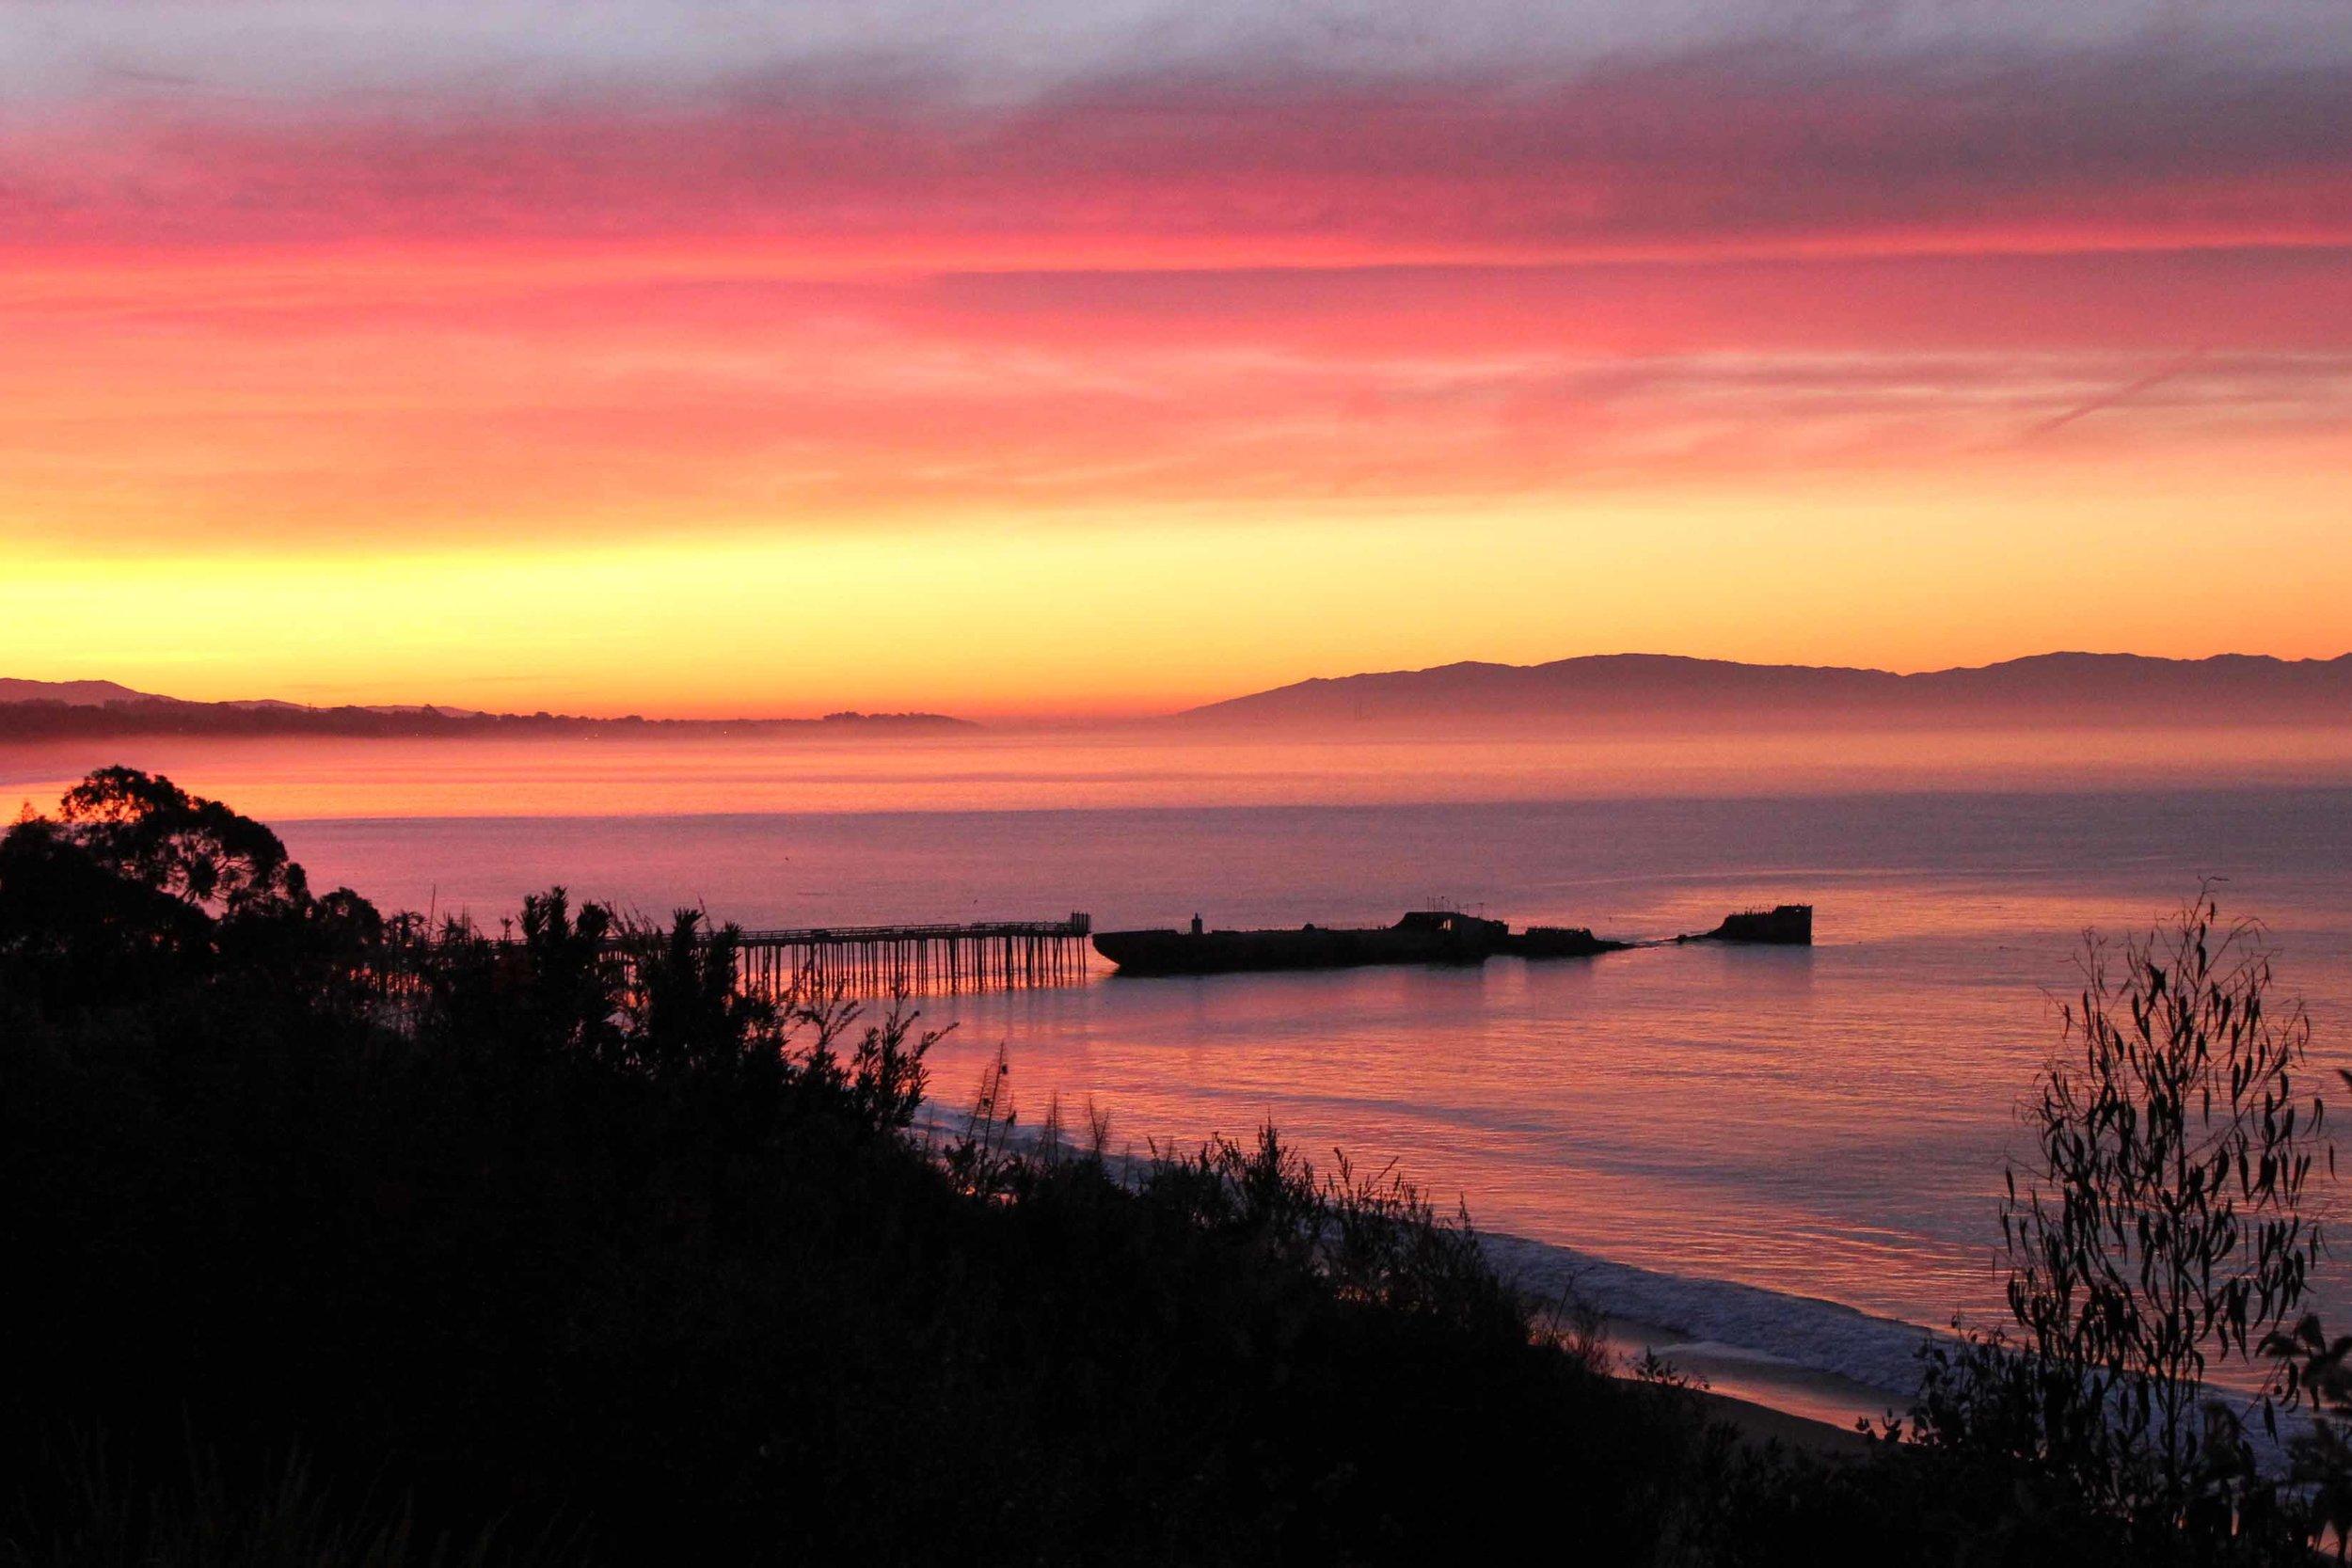 Seacliff Morning Sunrise